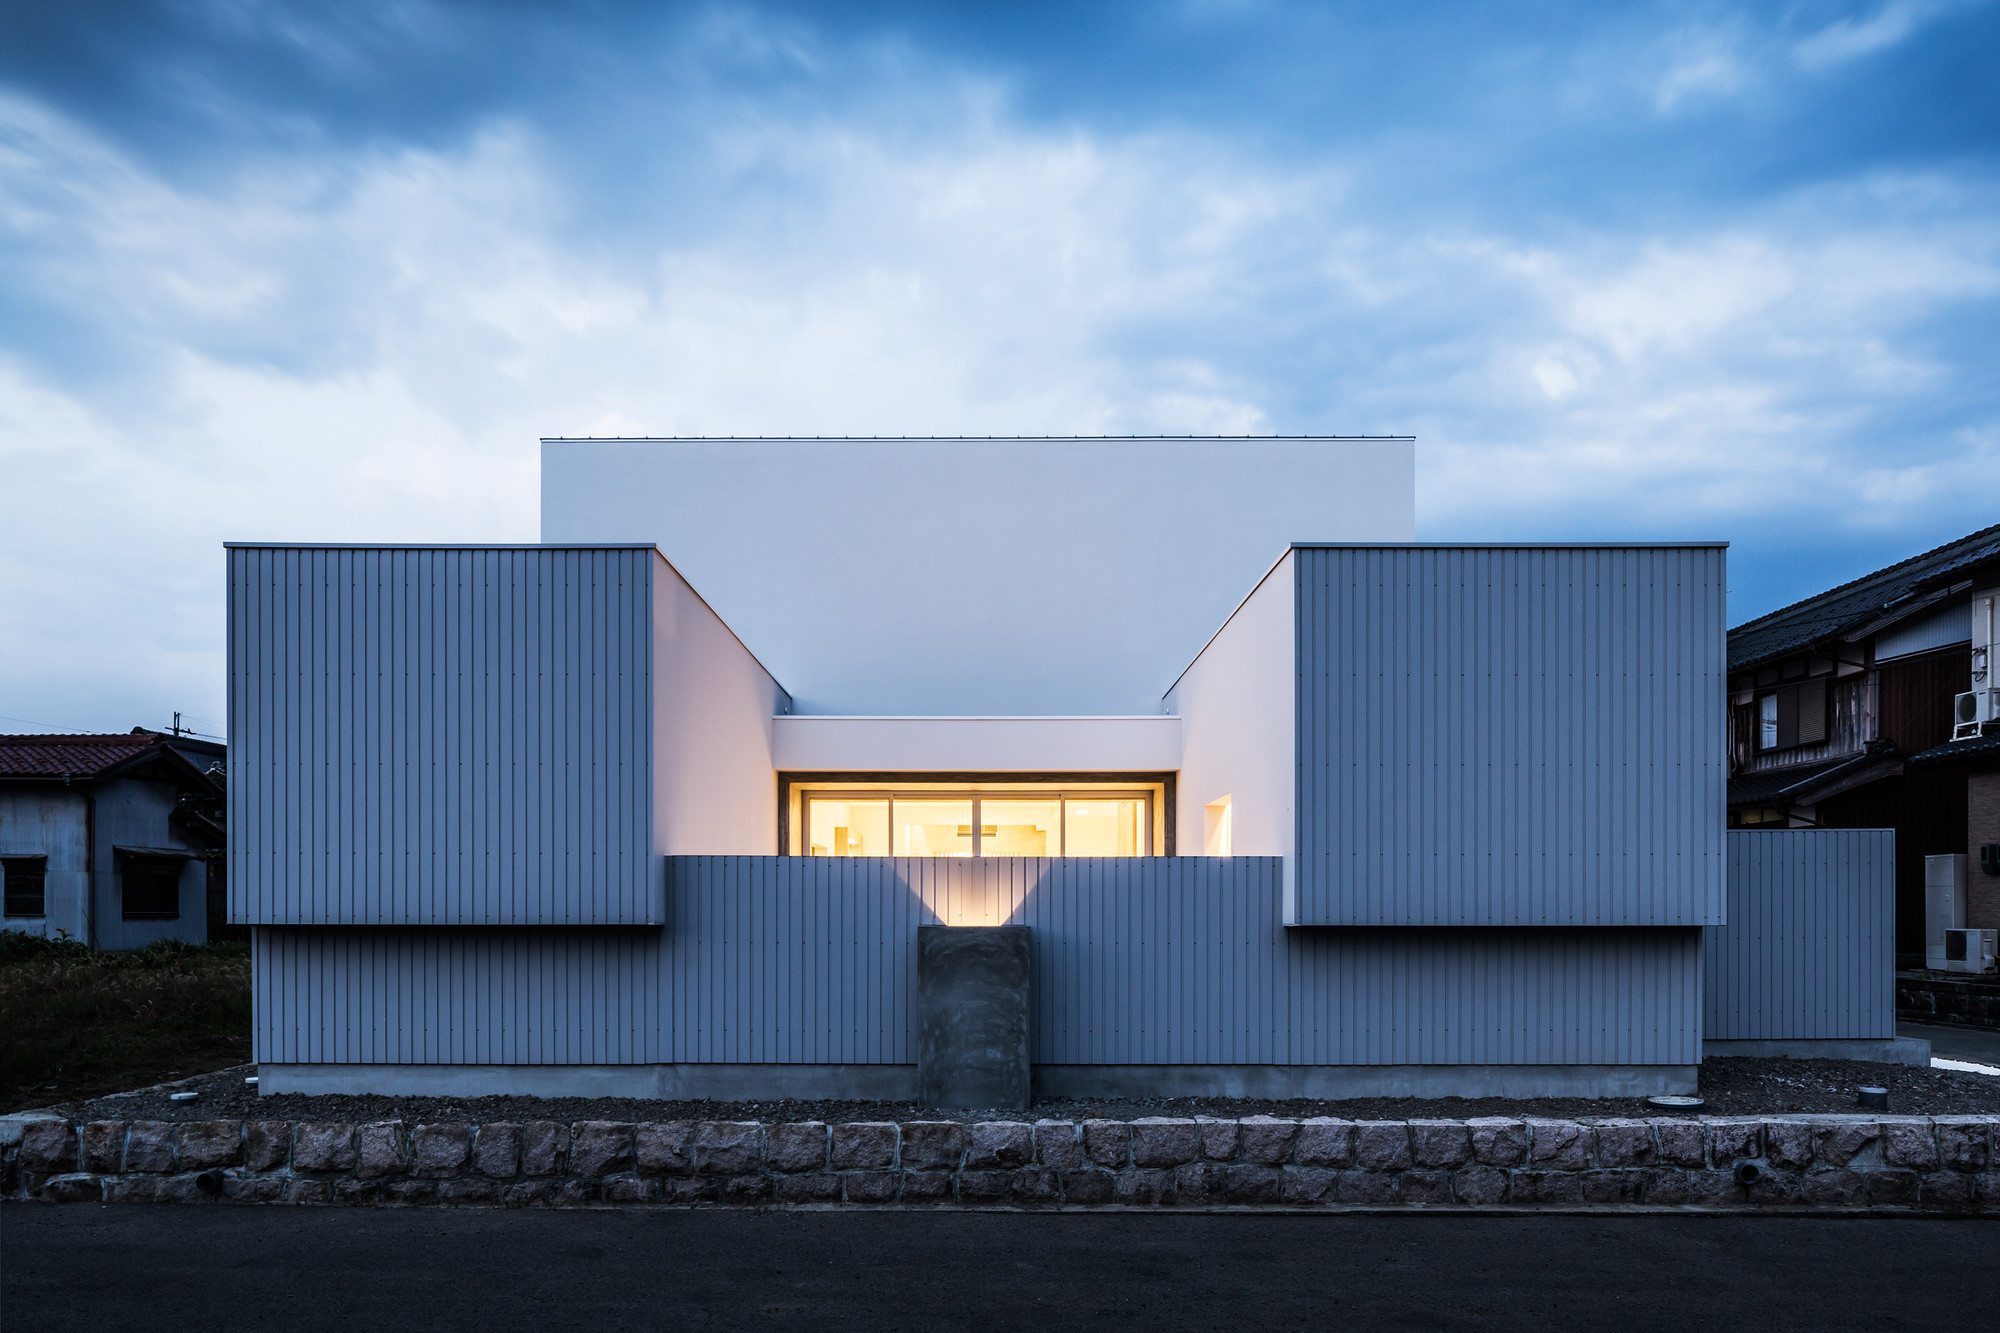 Courtyard House  FORM  Kouichi Kimura Architects  ArchDaily